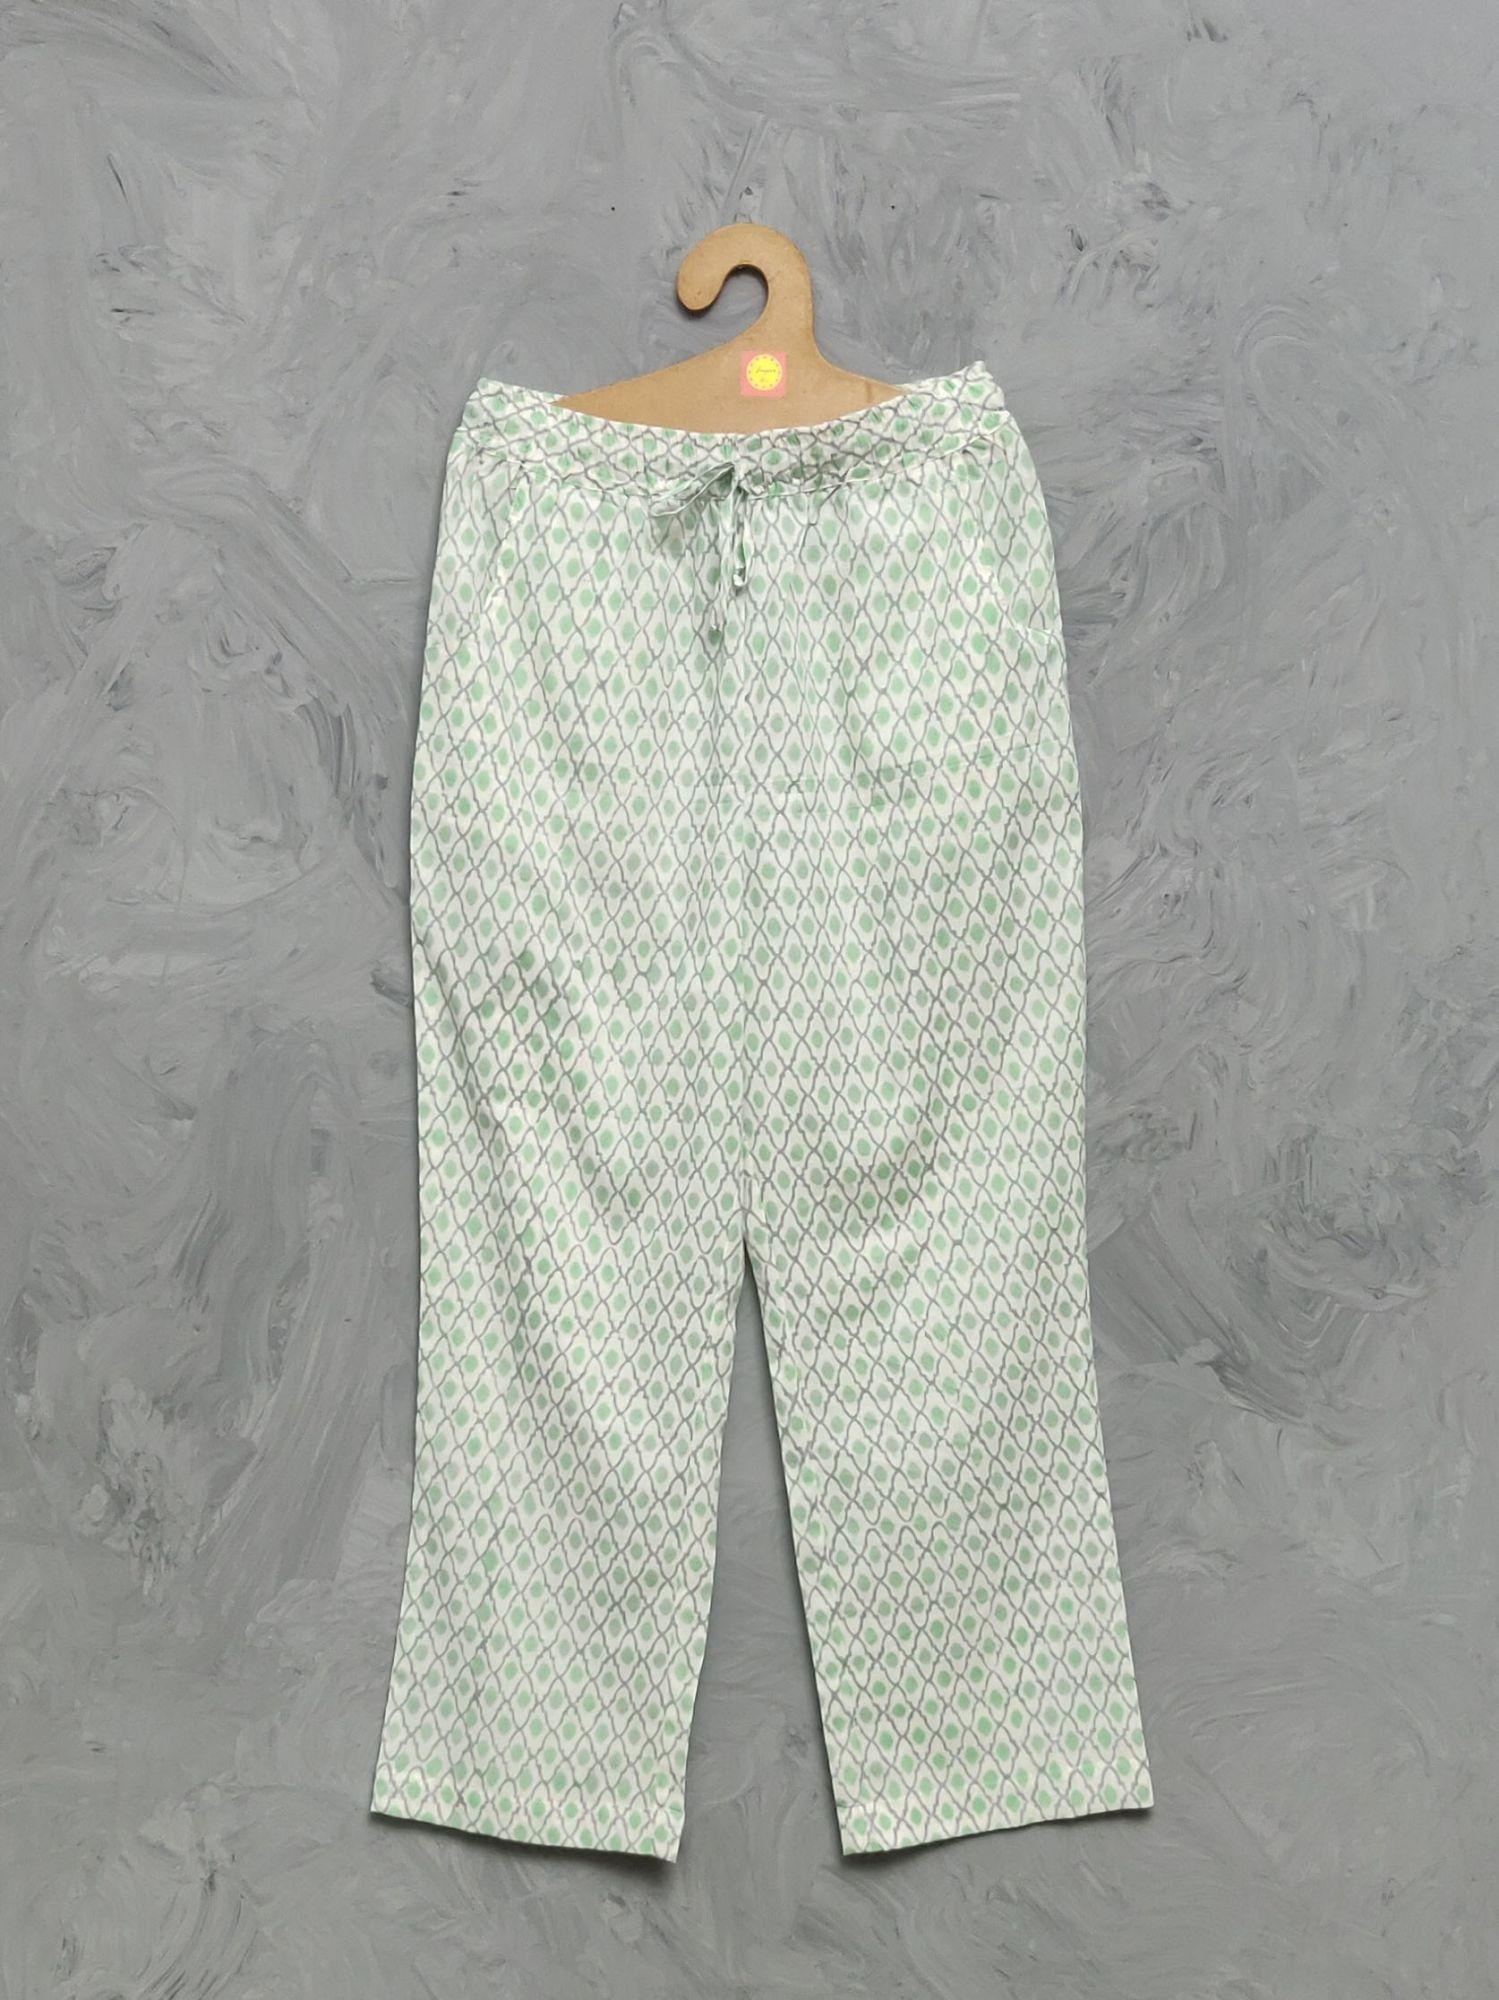 Cotton Handblock Print Night Suits WNS353